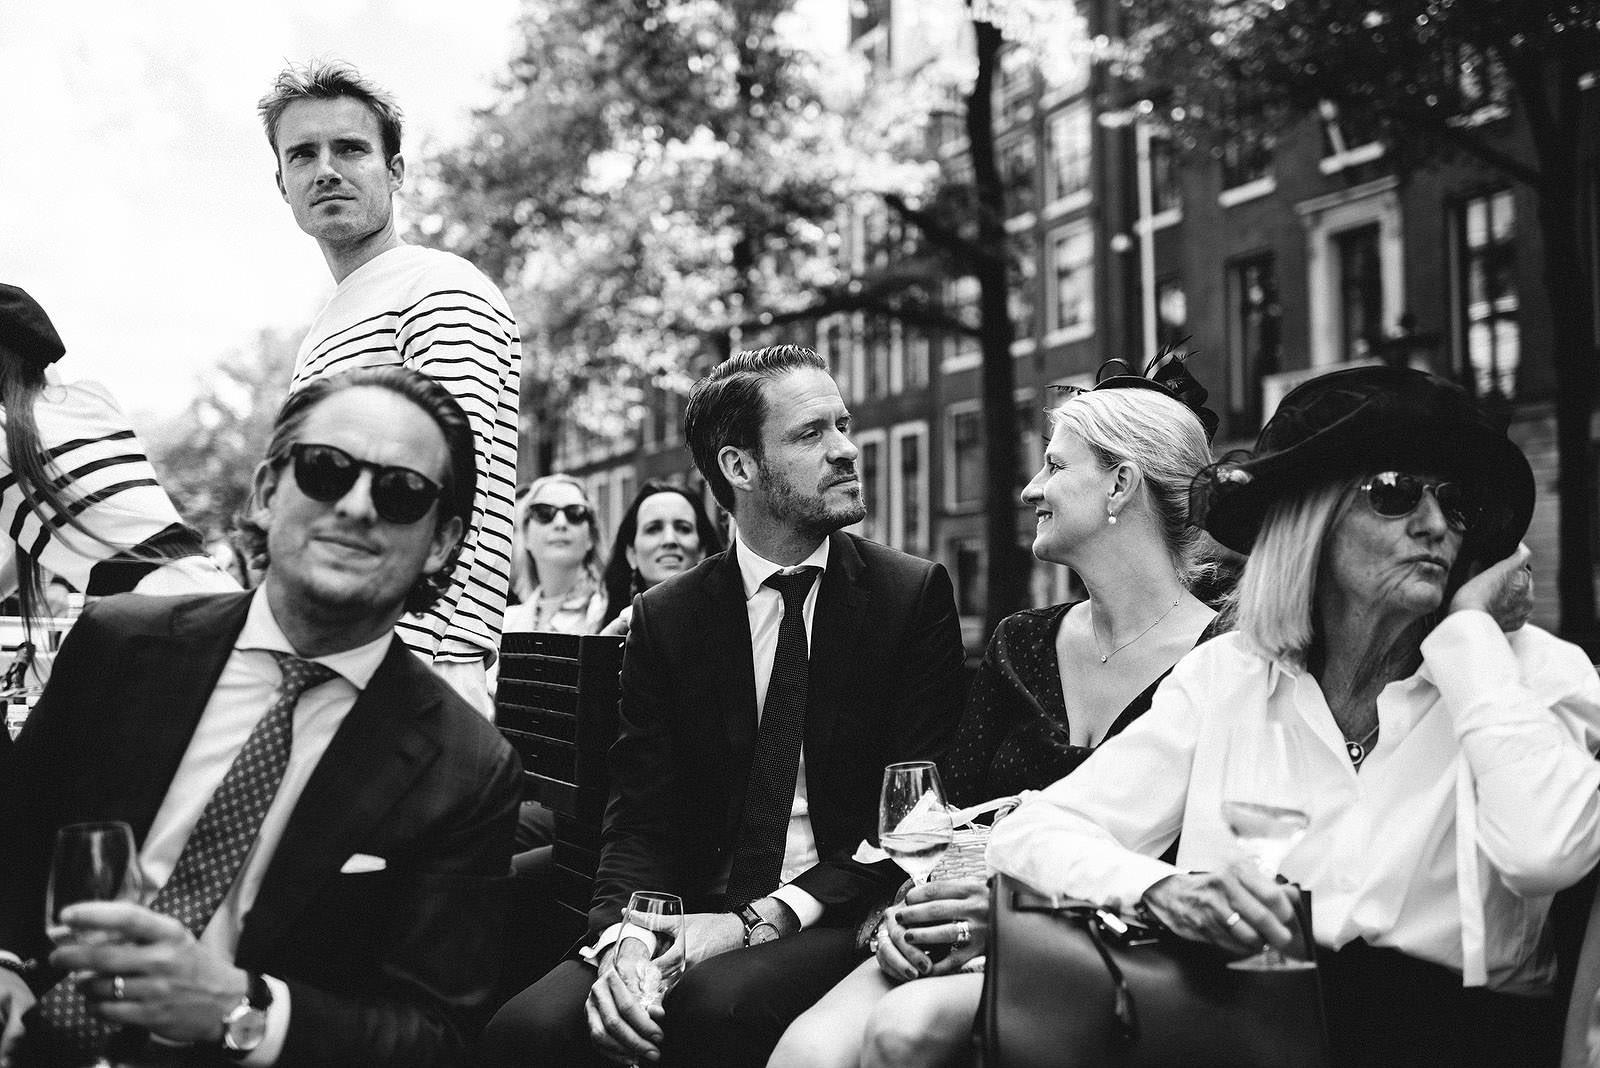 Fotograf Konstanz - Destination Wedding Photographer Amsterdam 059 - Destination Wedding Amsterdam  - 167 -